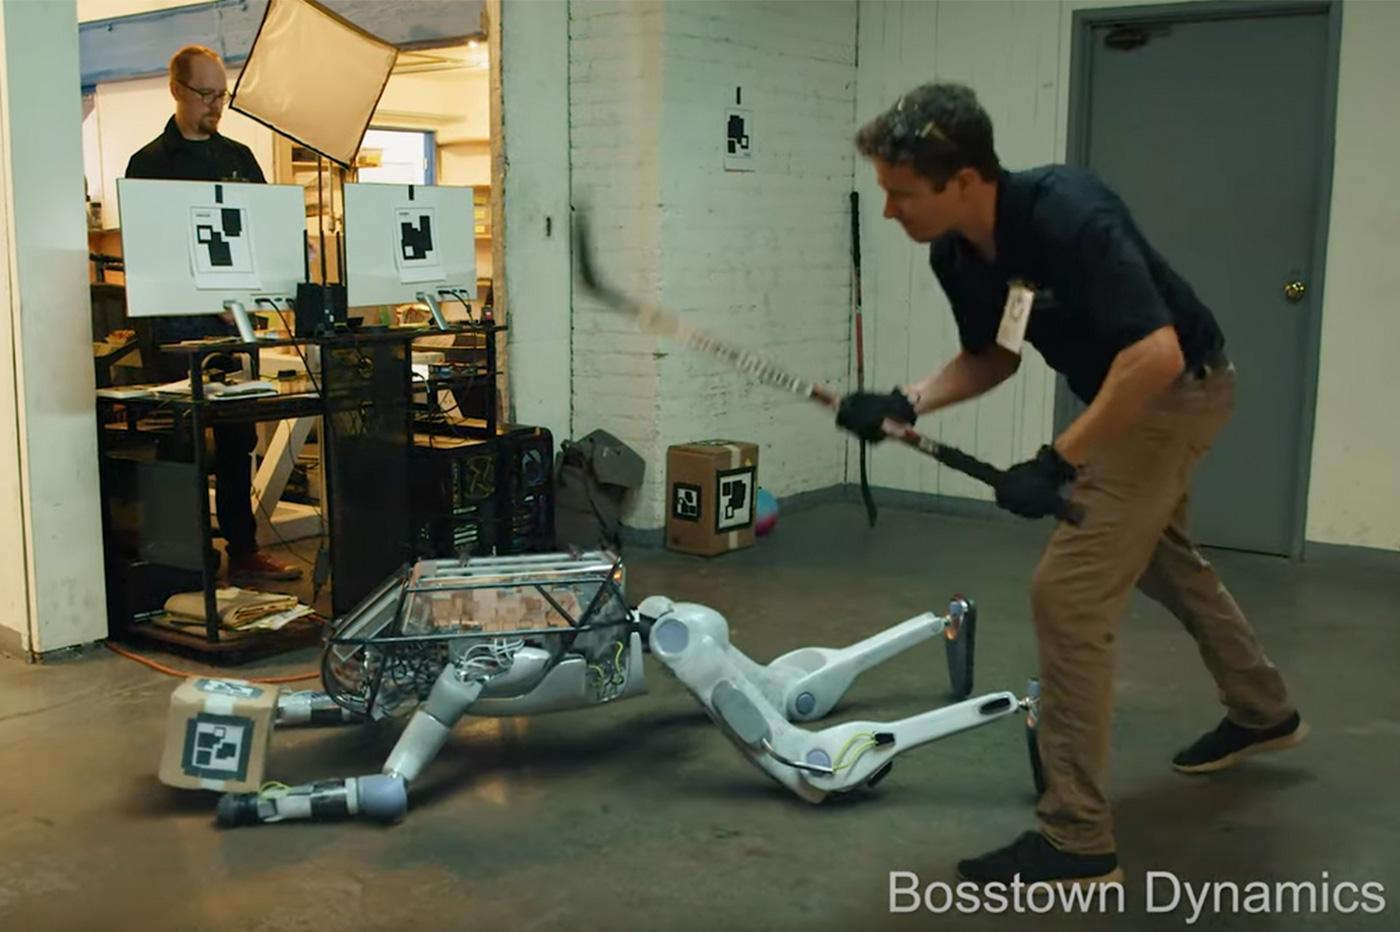 robot Boston Dynamics Corridor